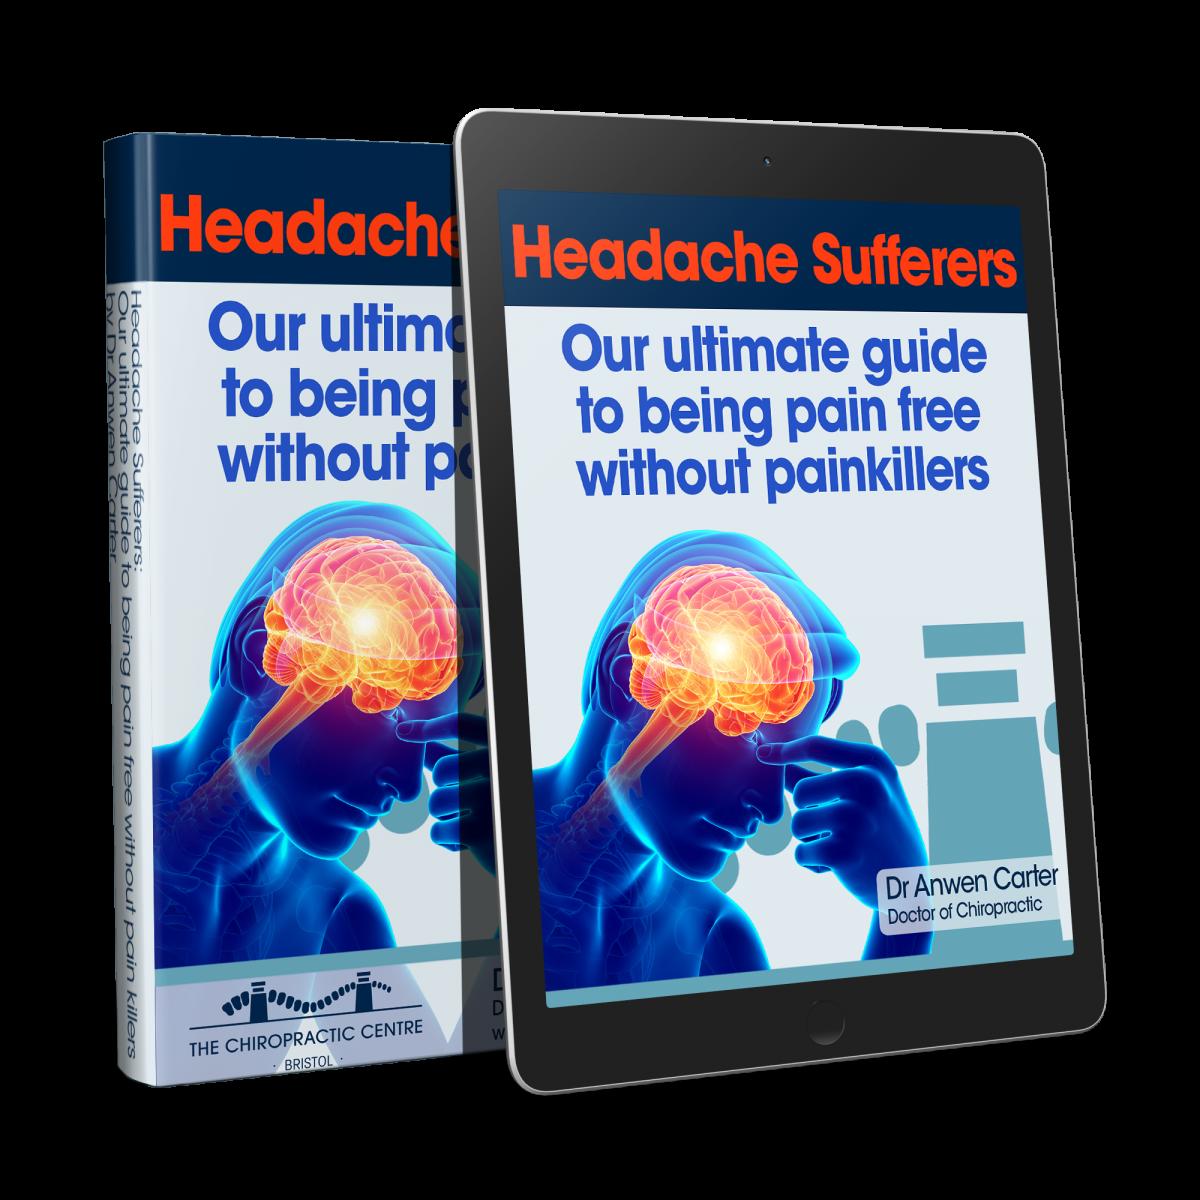 Headache Sufferers Guide